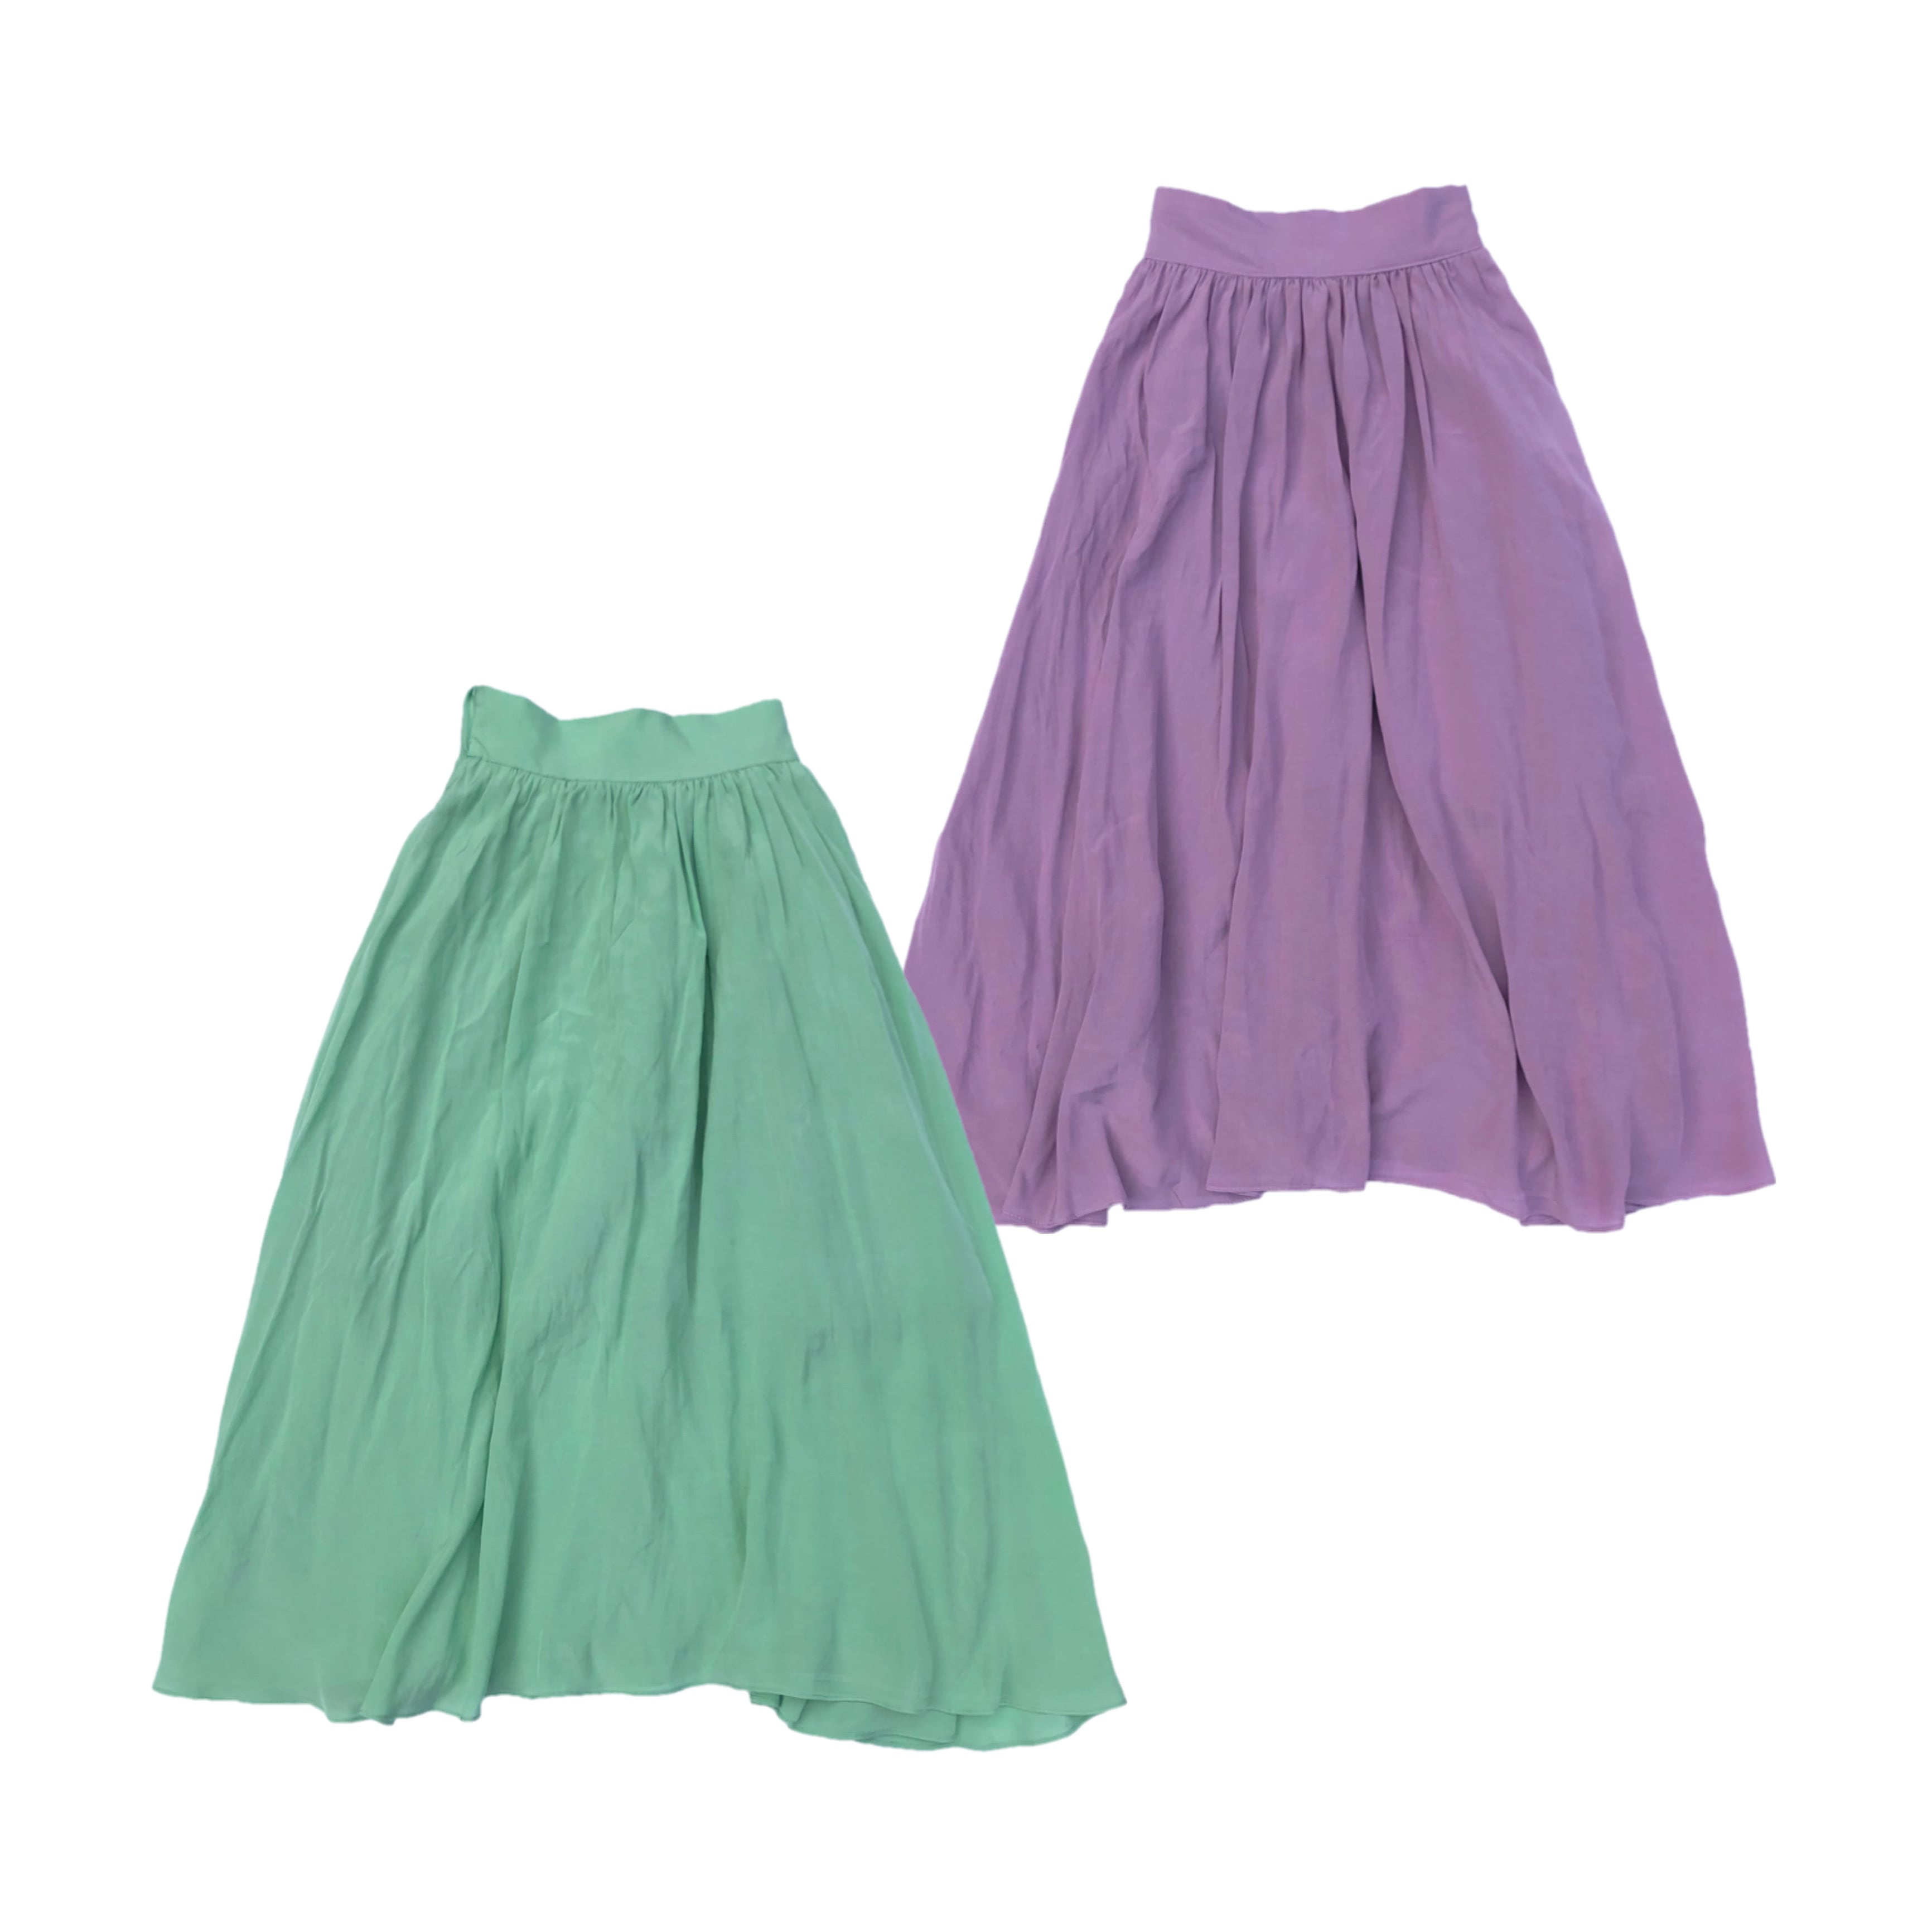 【MINT:即納】パステルカラーフレアスカート